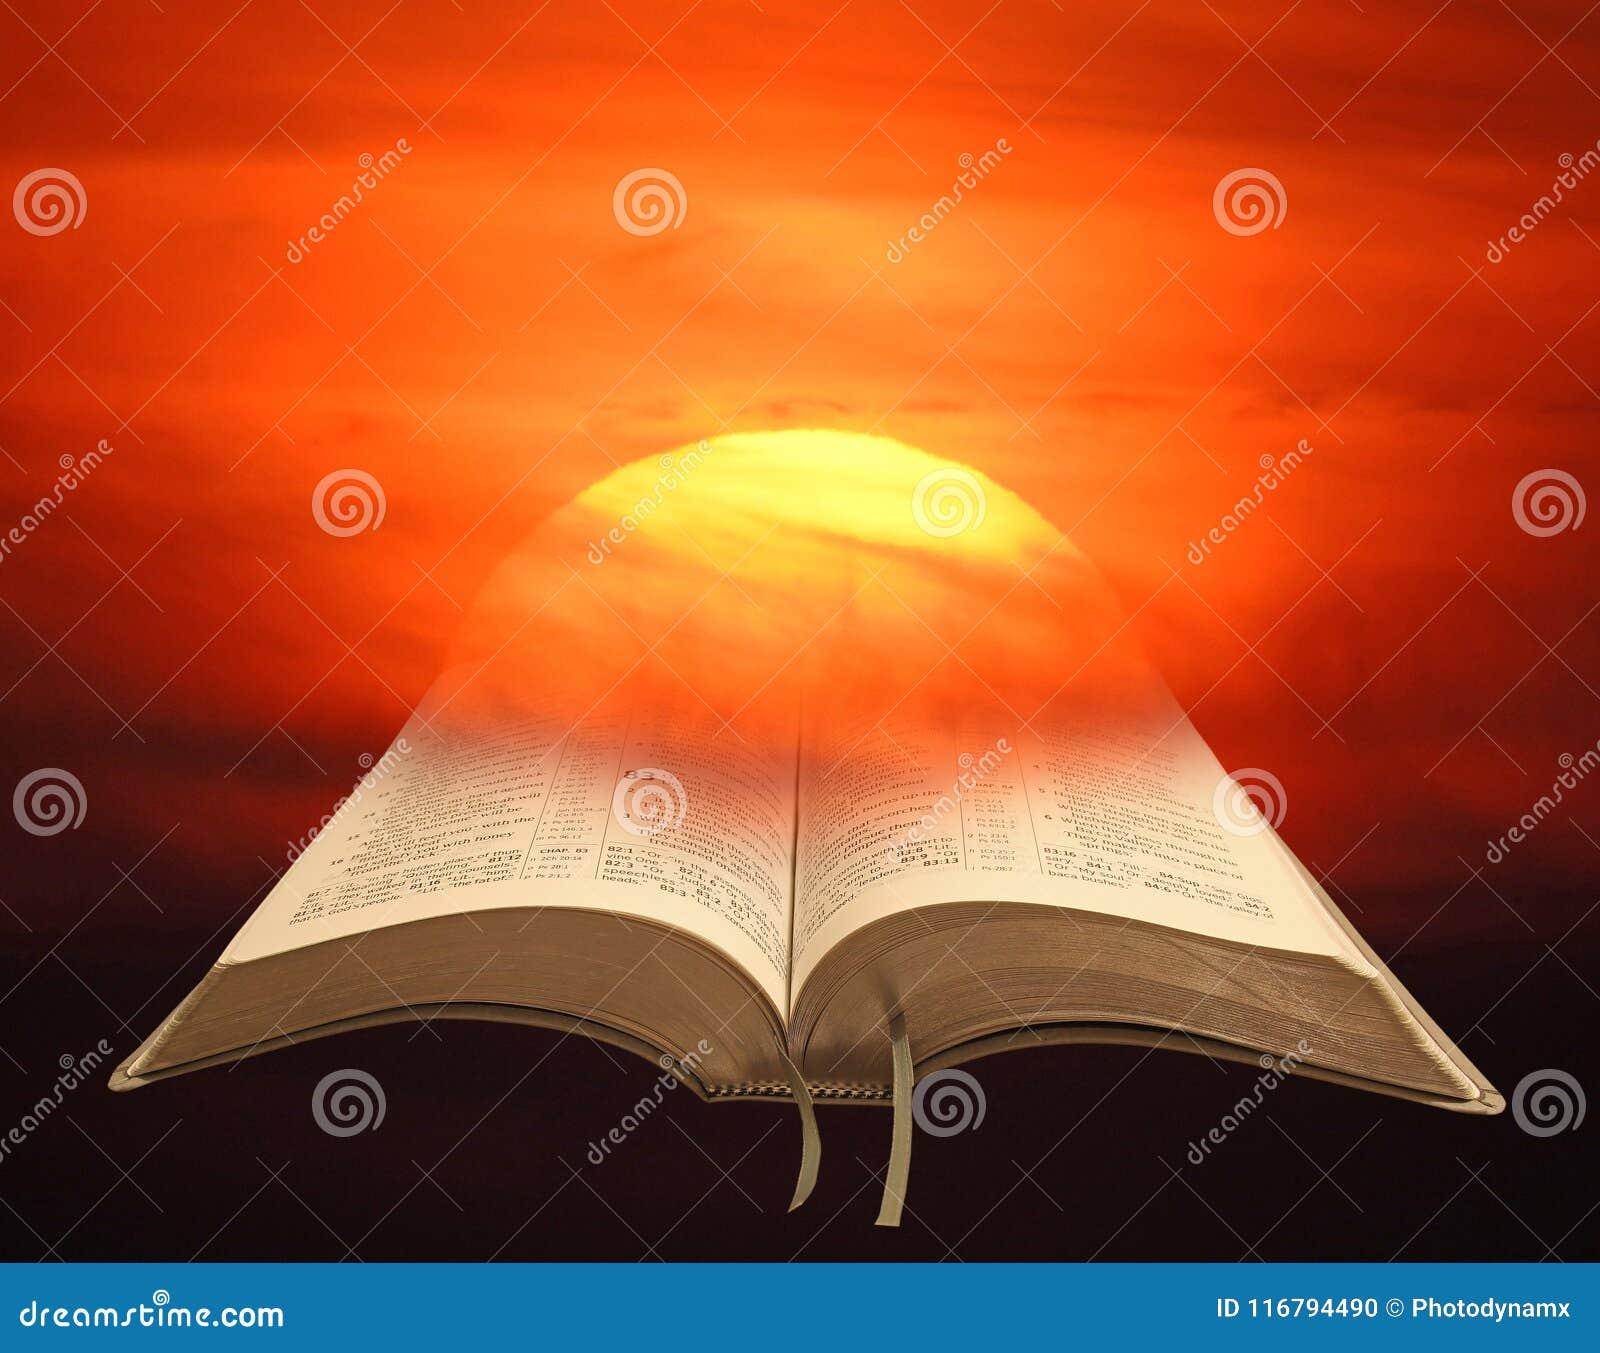 Sunset watercolour painting sky clouds art bible